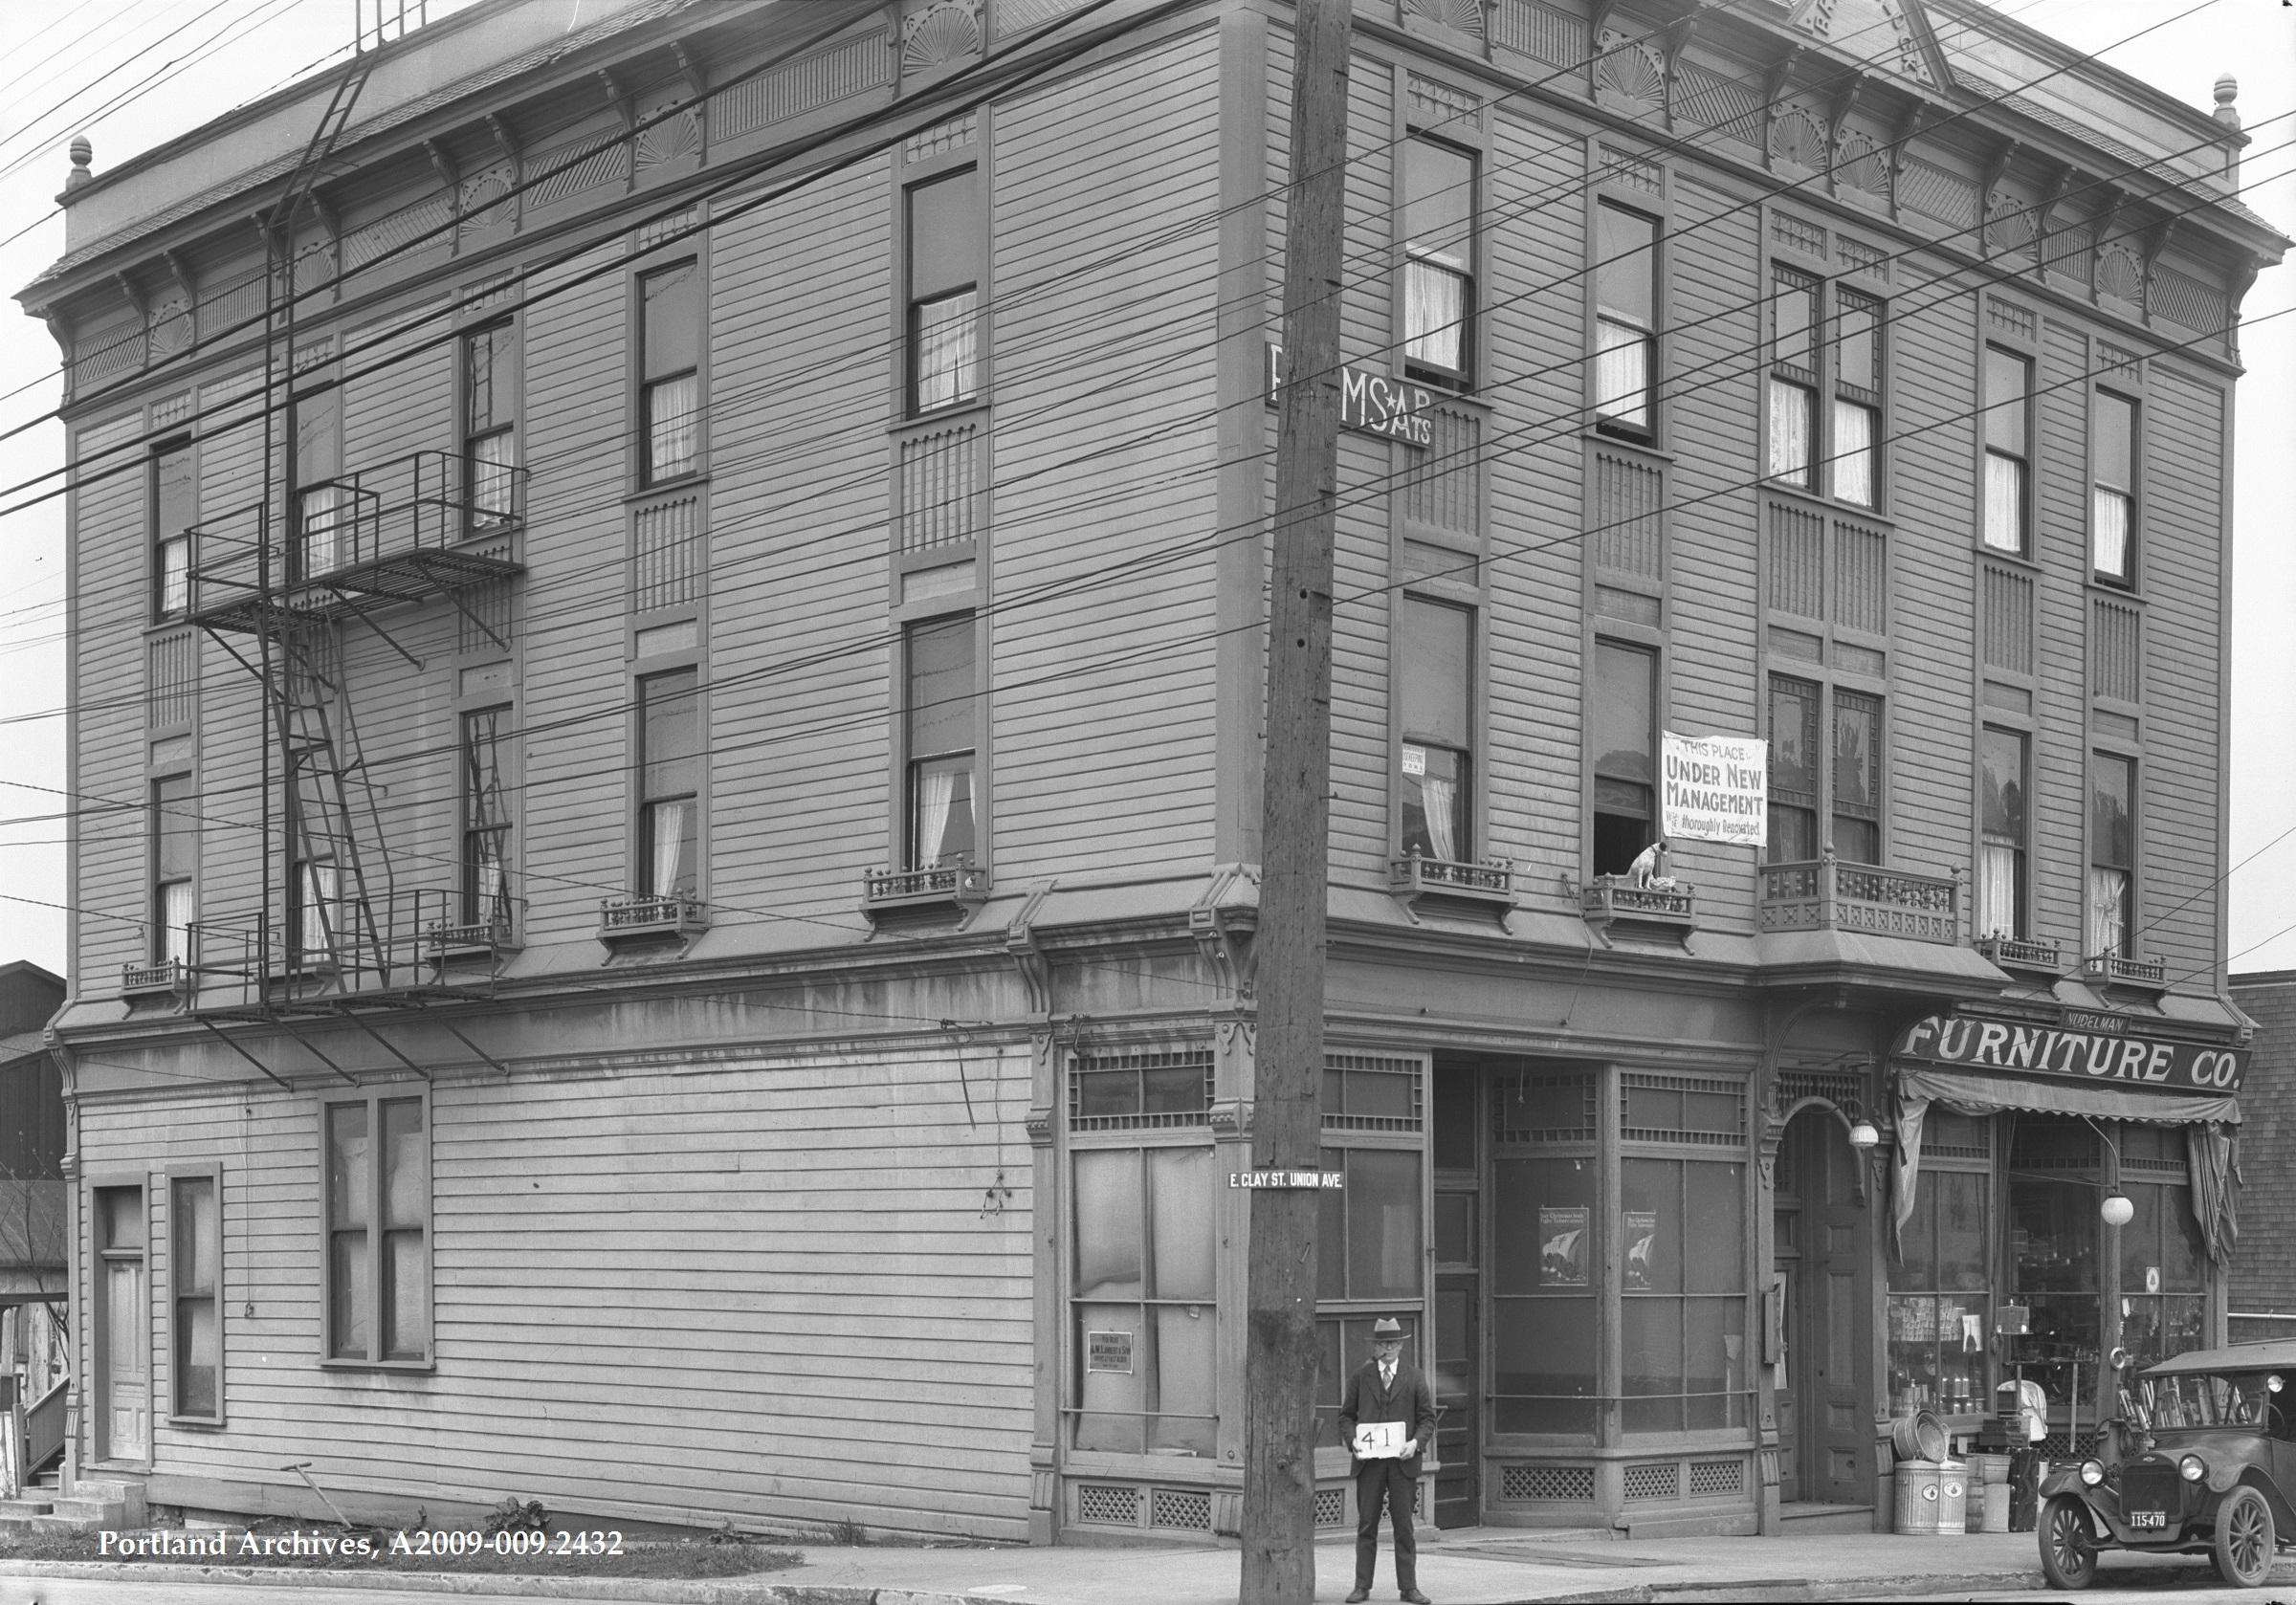 City of Portland Archives, Oregon, A2009-009.2432